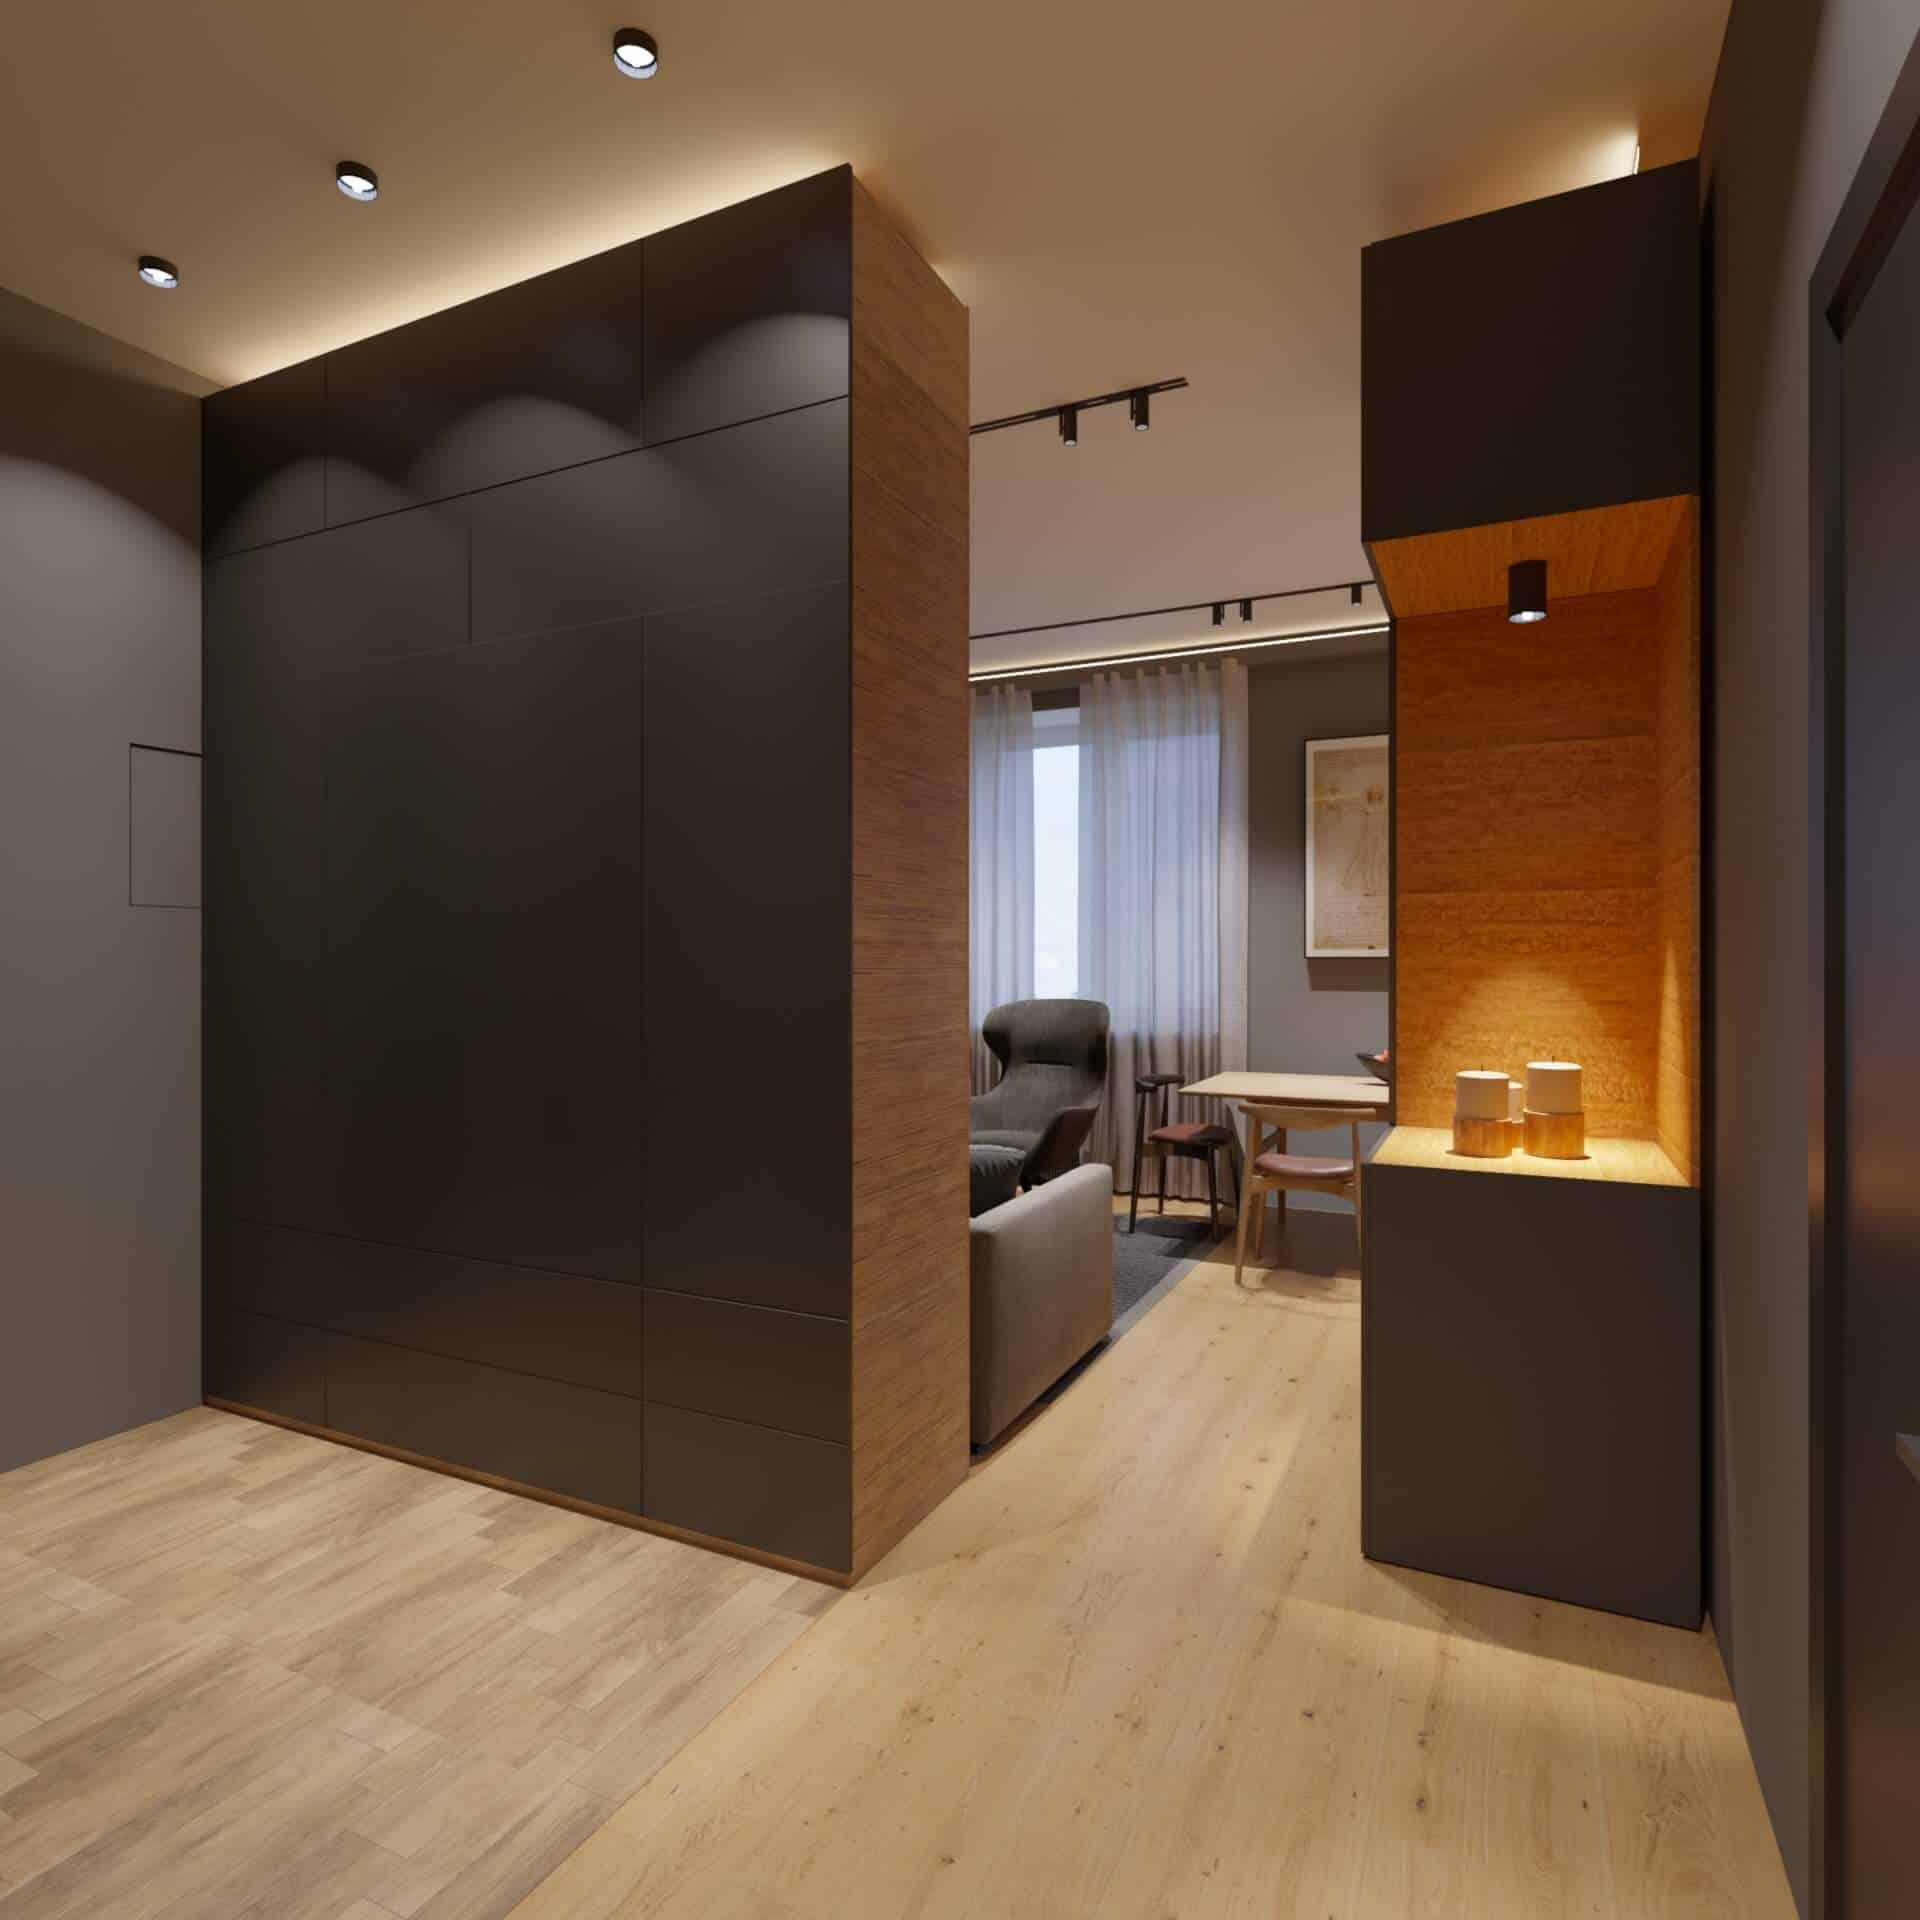 6 — living room